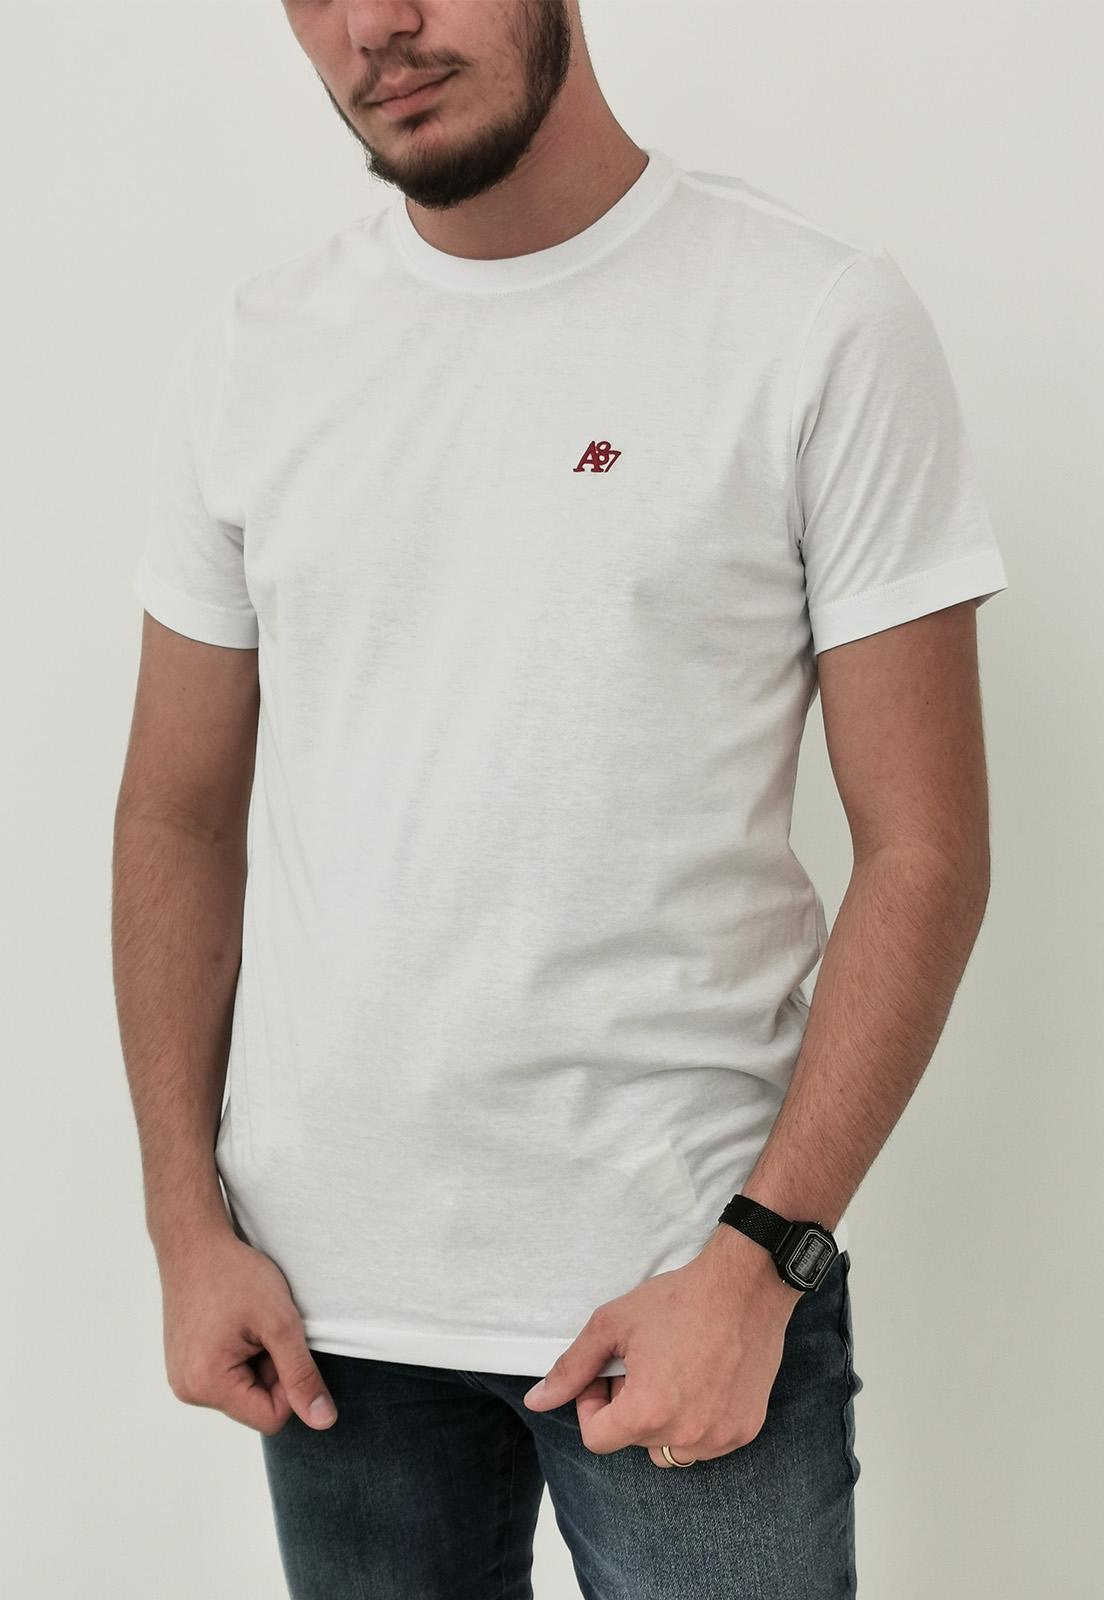 Camiseta Aéropostale Branca Básica